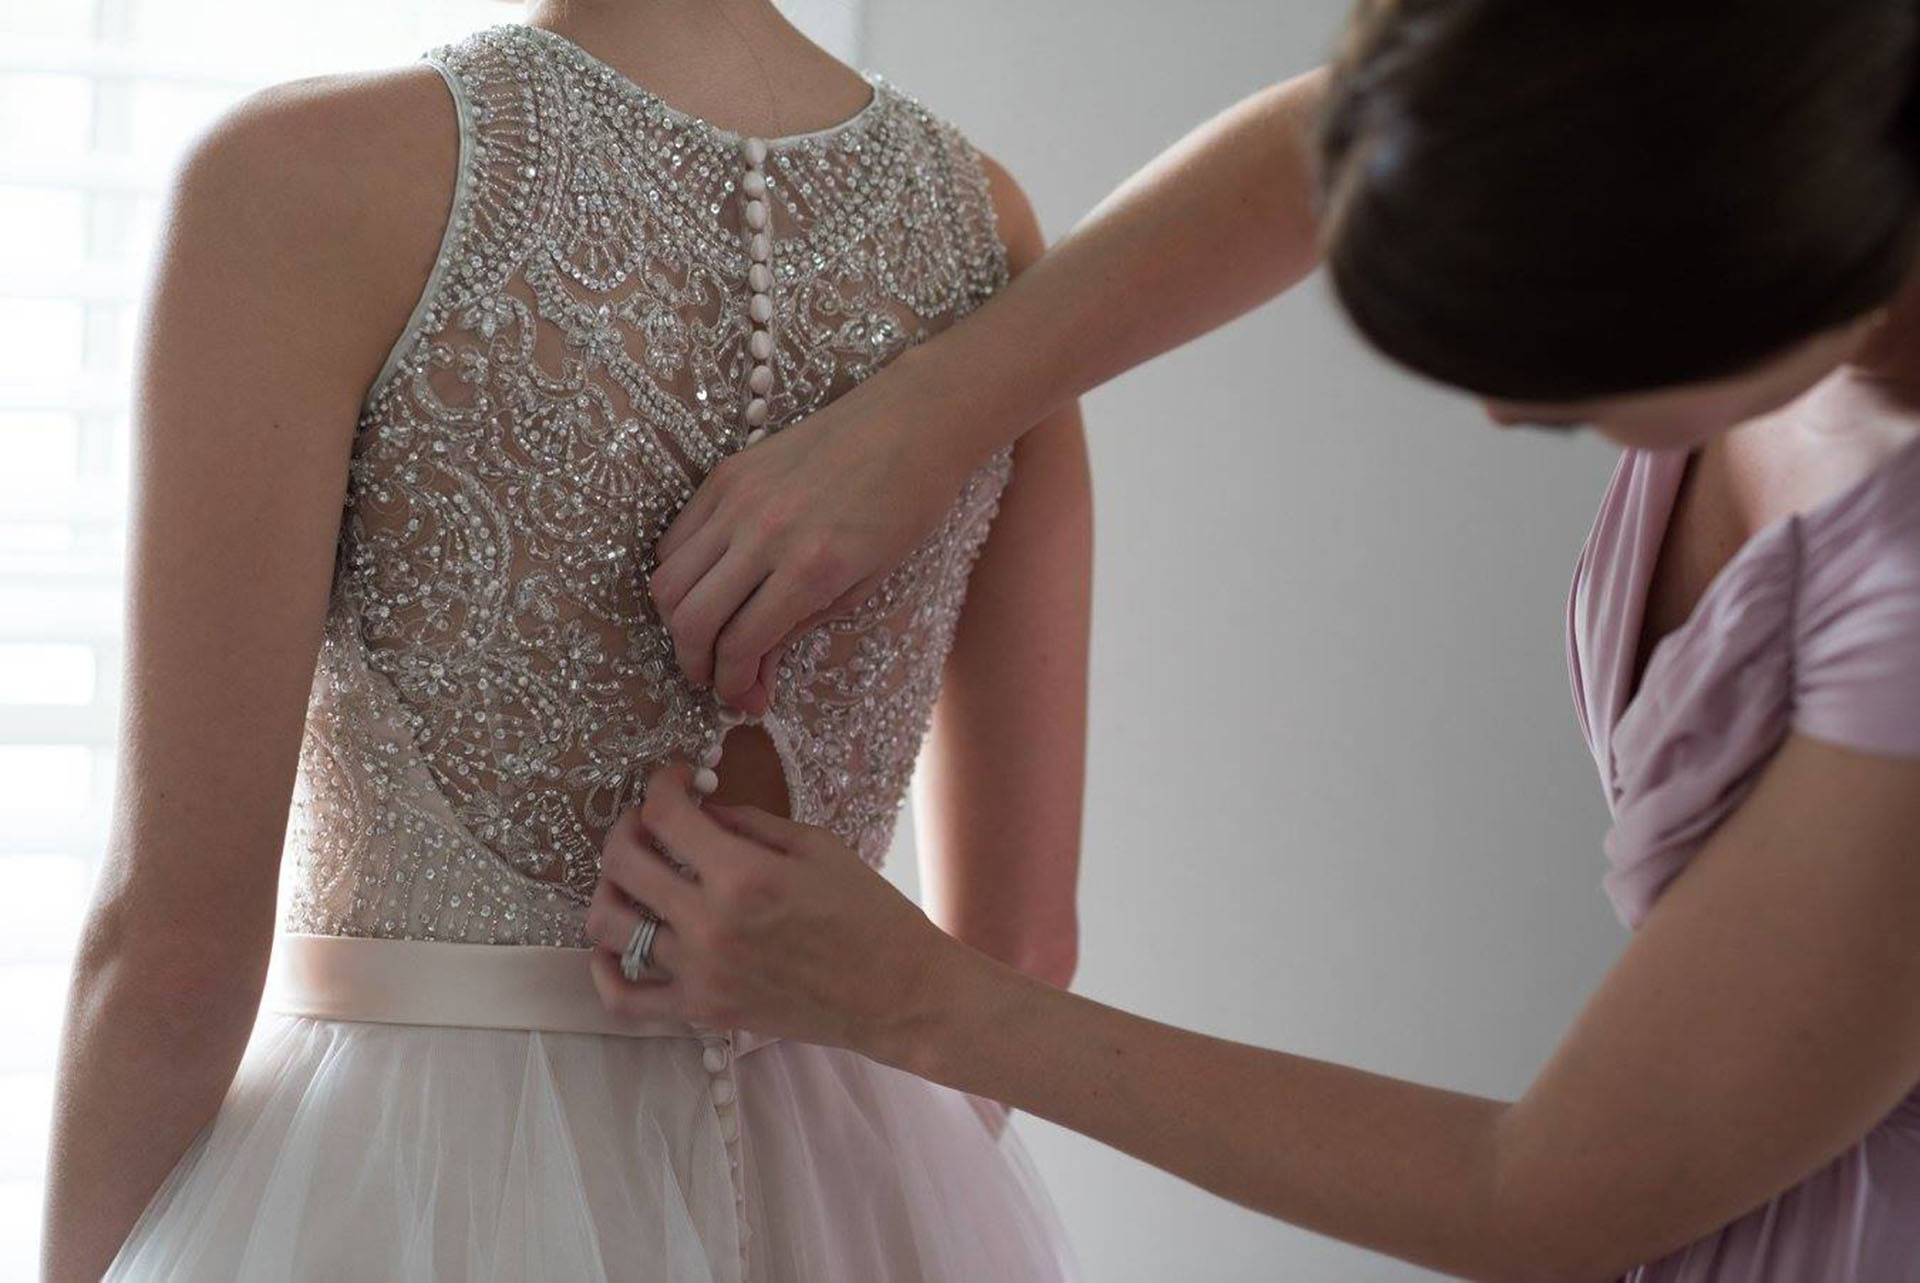 Leslie getting into her wedding dress